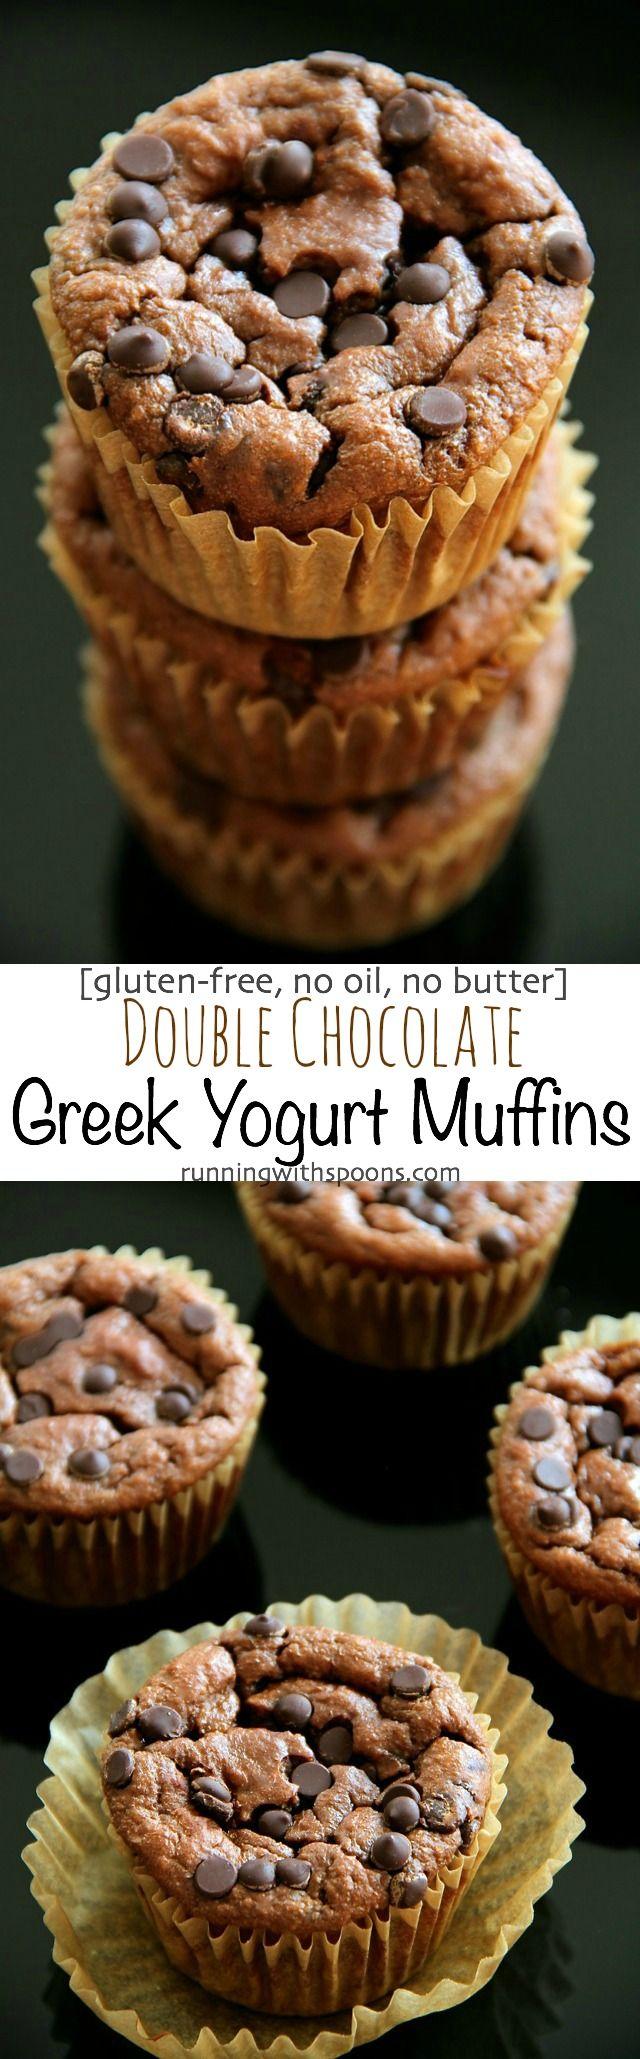 . double chocolate greek yogurt muffins .